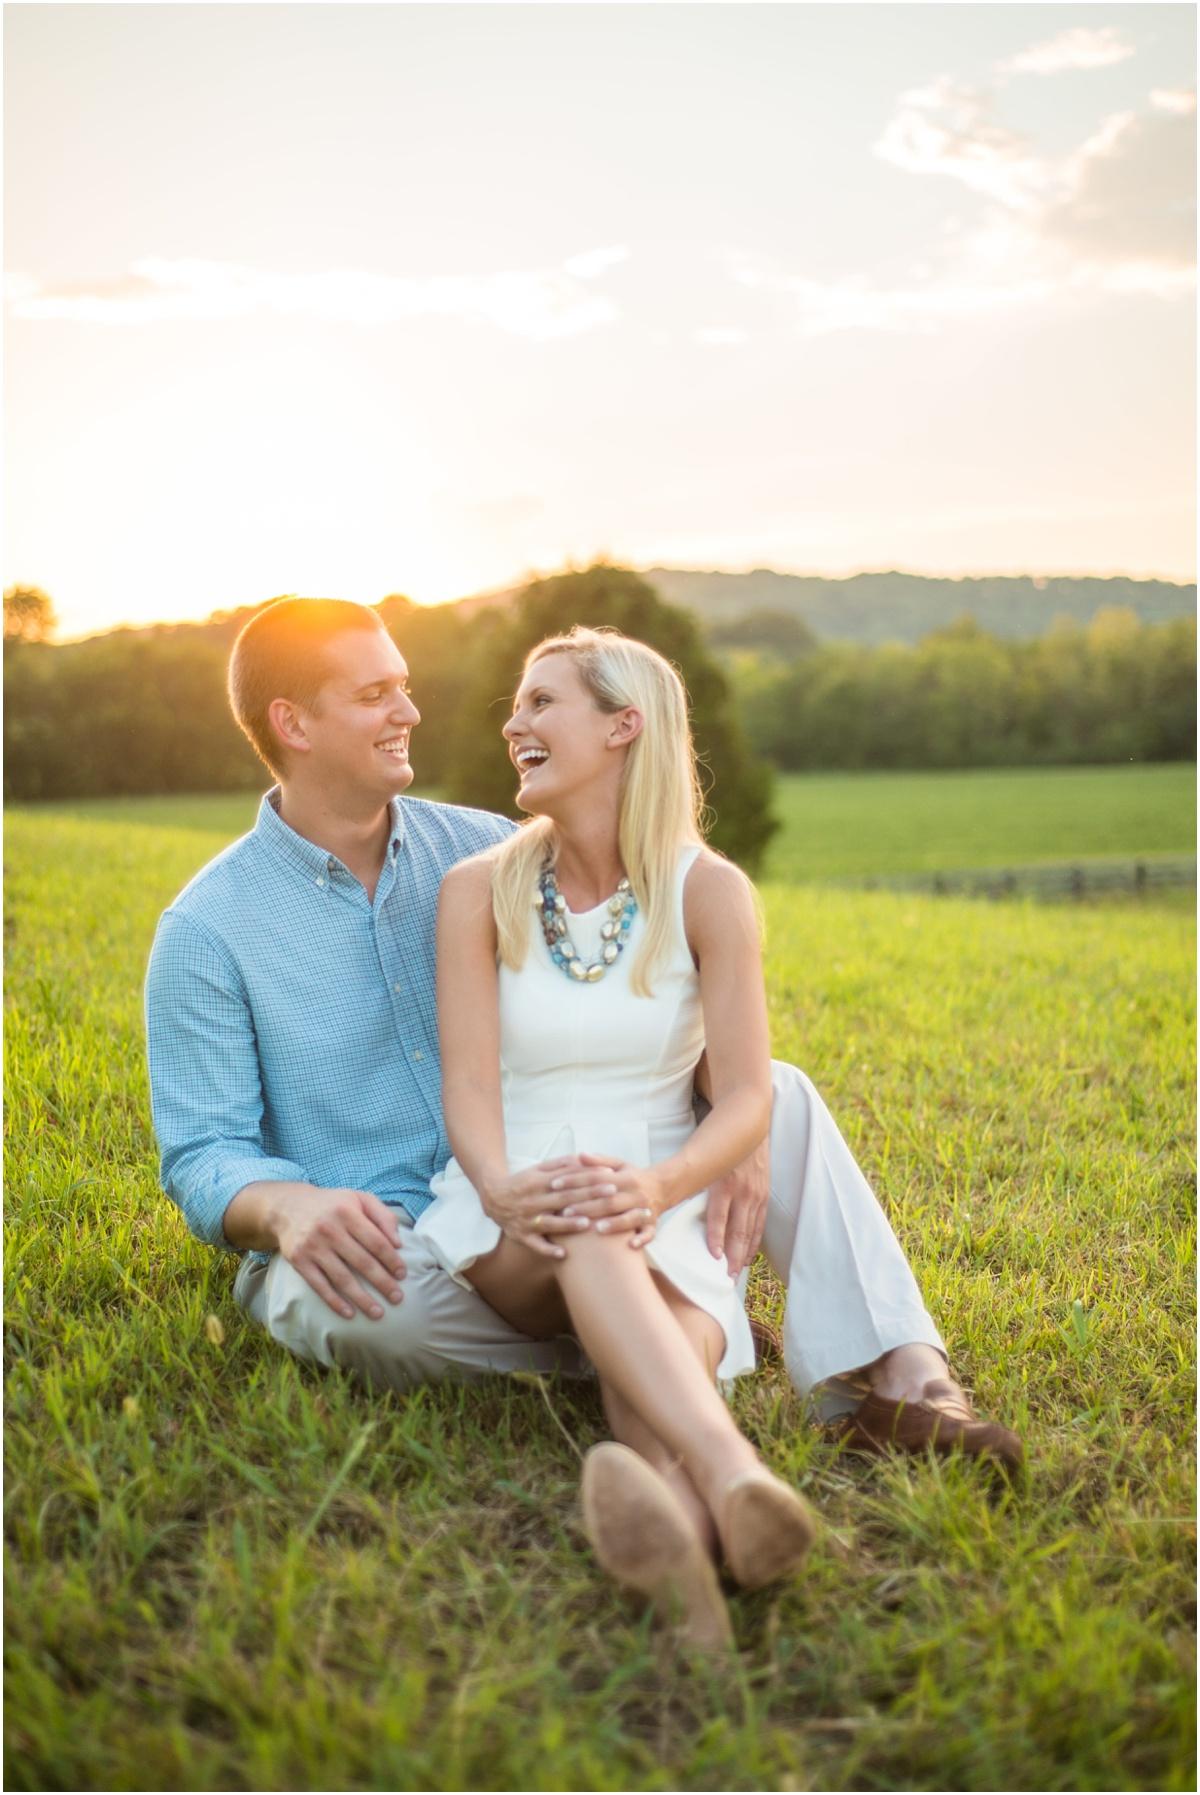 Greg Smit Photography Nashville wedding photographer Mint Springs Farm_0082